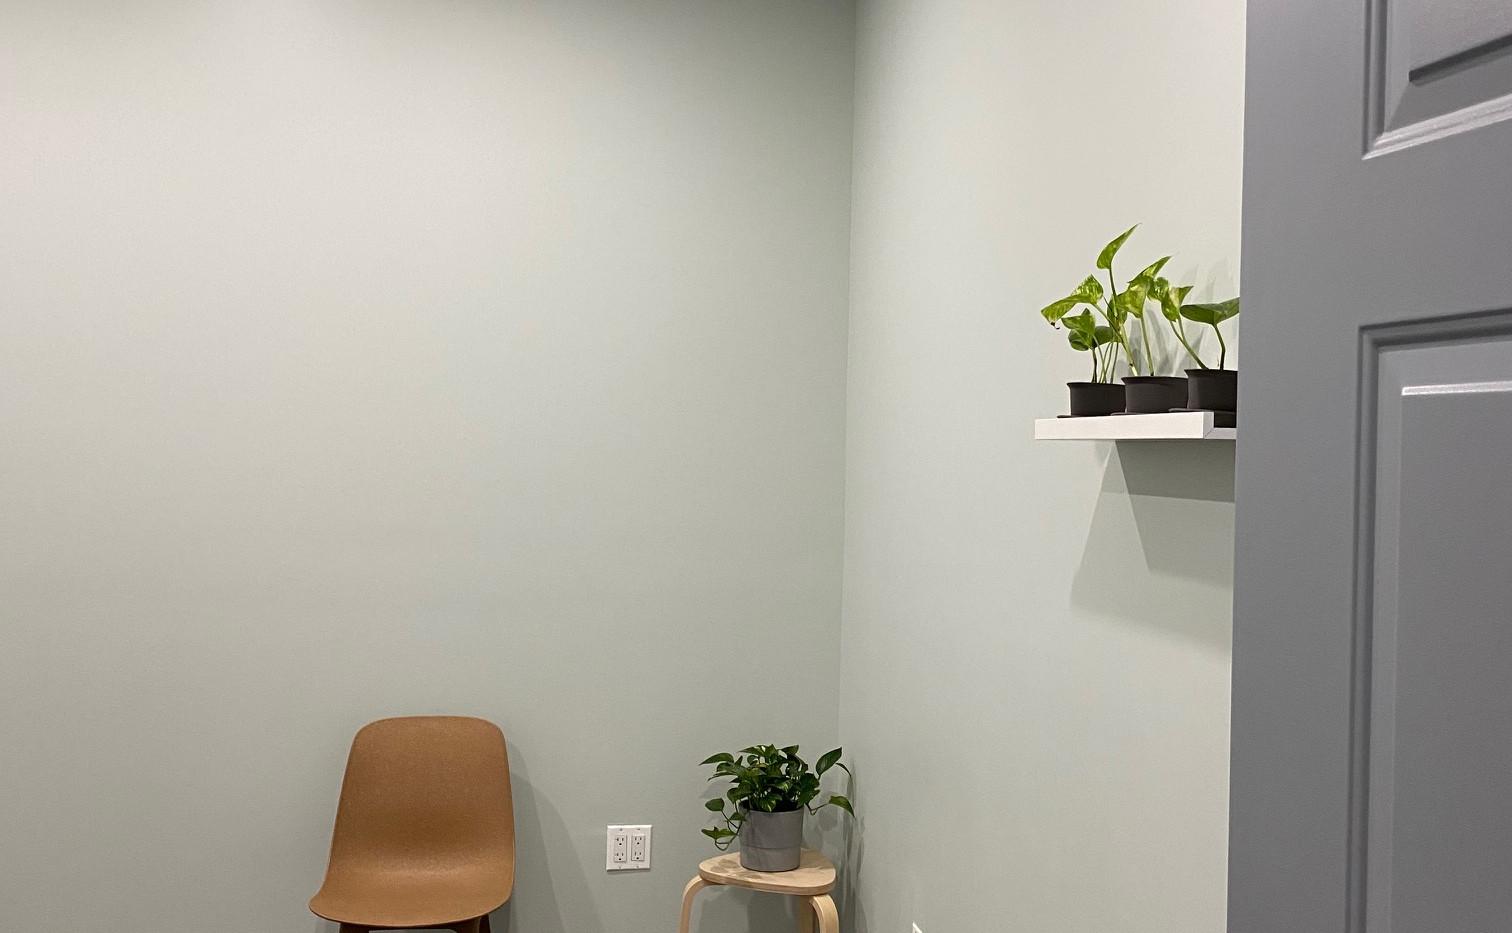 Wisdom Room